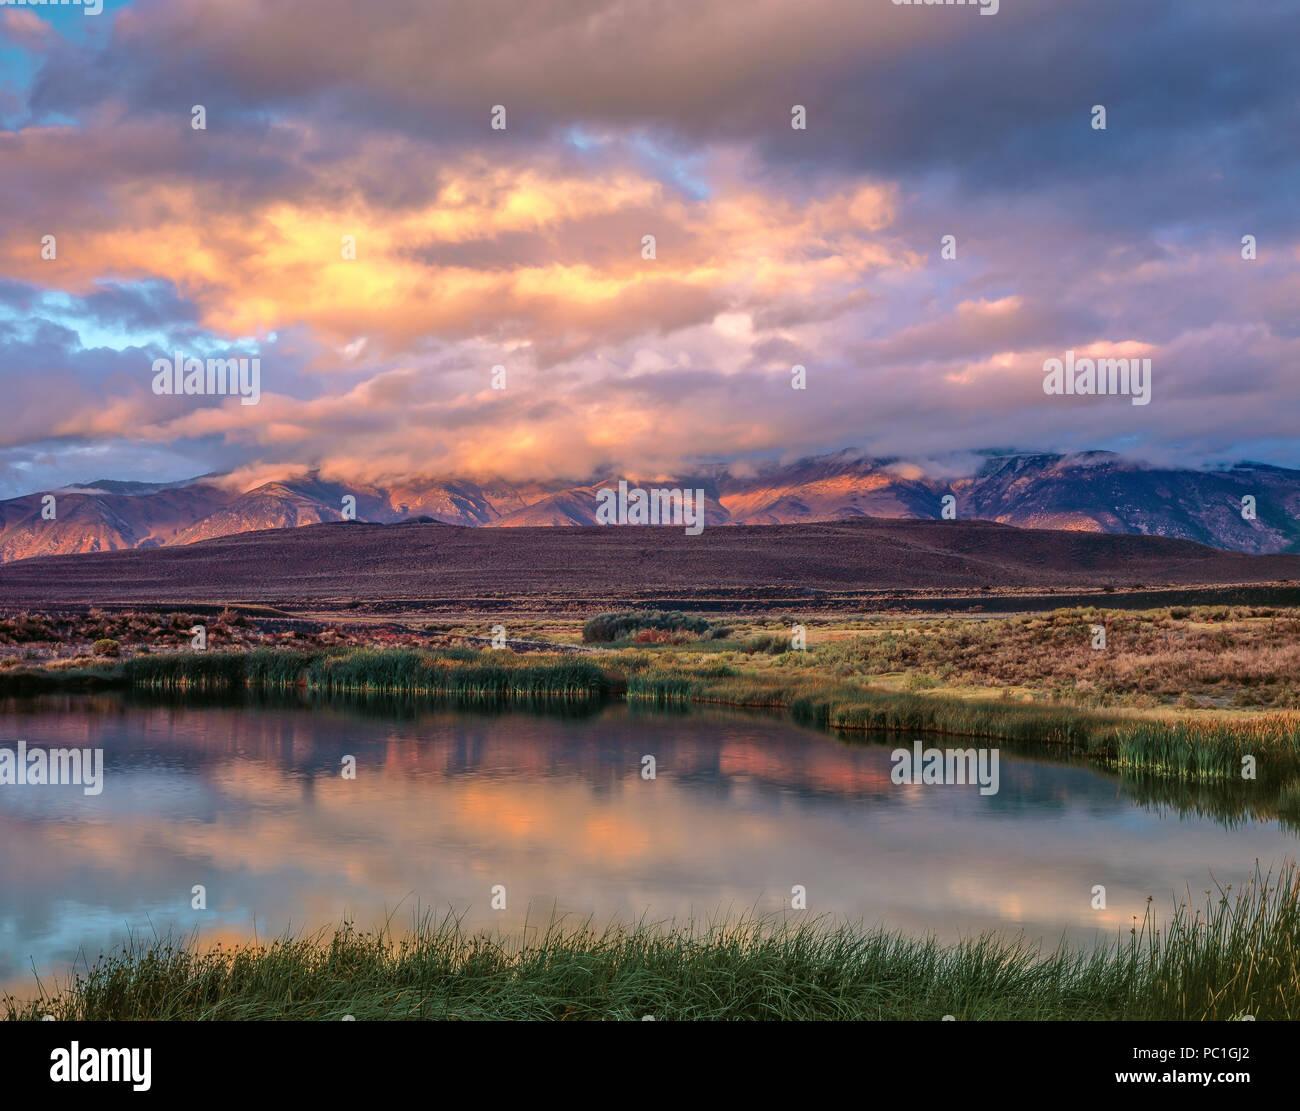 Sunrise, Feuchtgebiete, Mono Basin National Forest Scenic Area, Inyo National Forest, östlichen Sierra, Kalifornien Stockbild